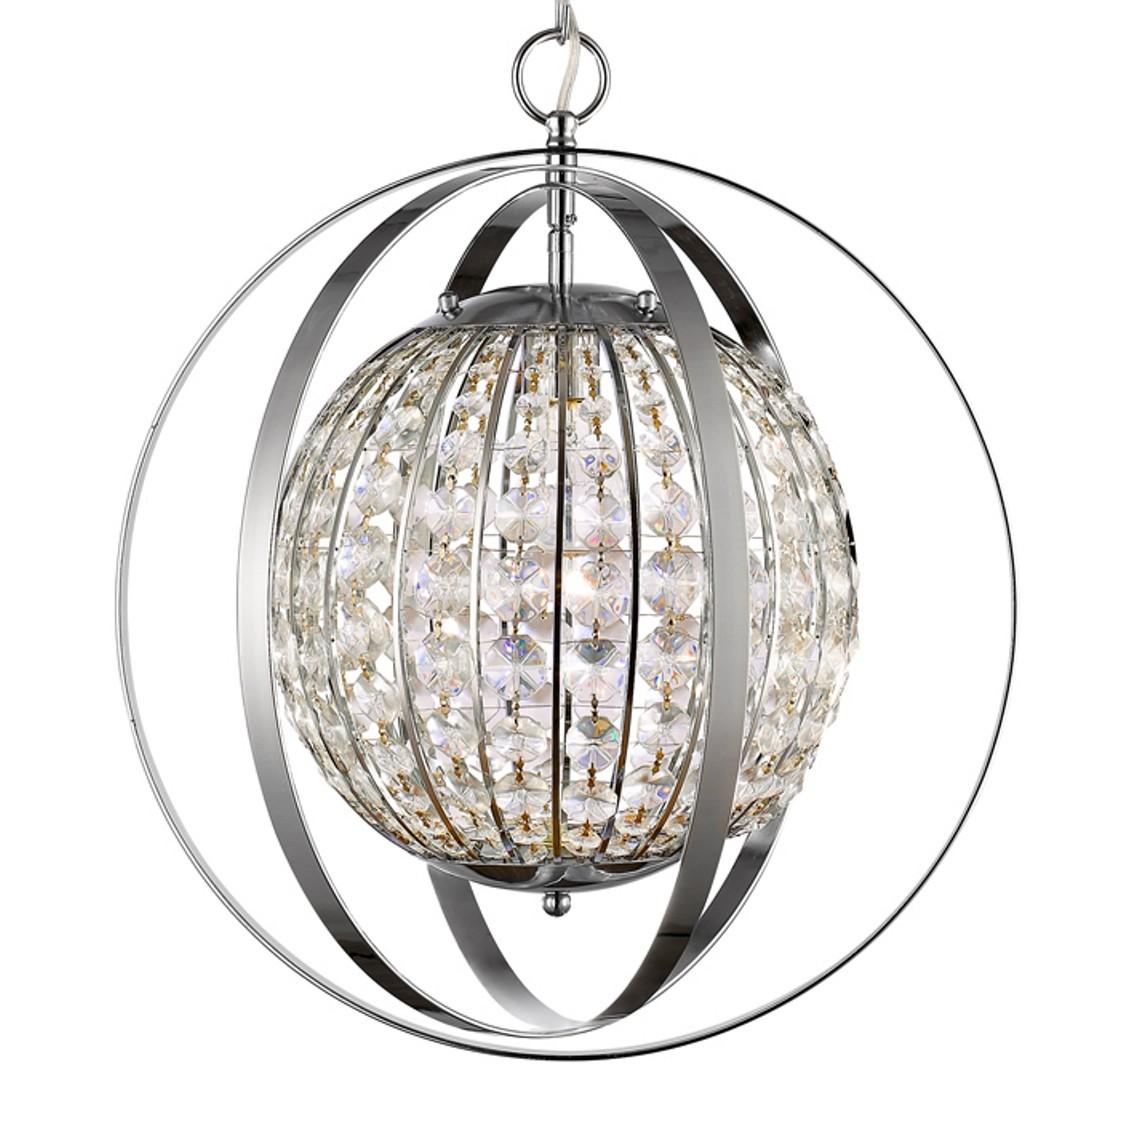 Olivia polished nickel crystal pendant light 16wx19h in11096pn olivia polished nickel crystal sphere pendant light 16wx19h aloadofball Gallery